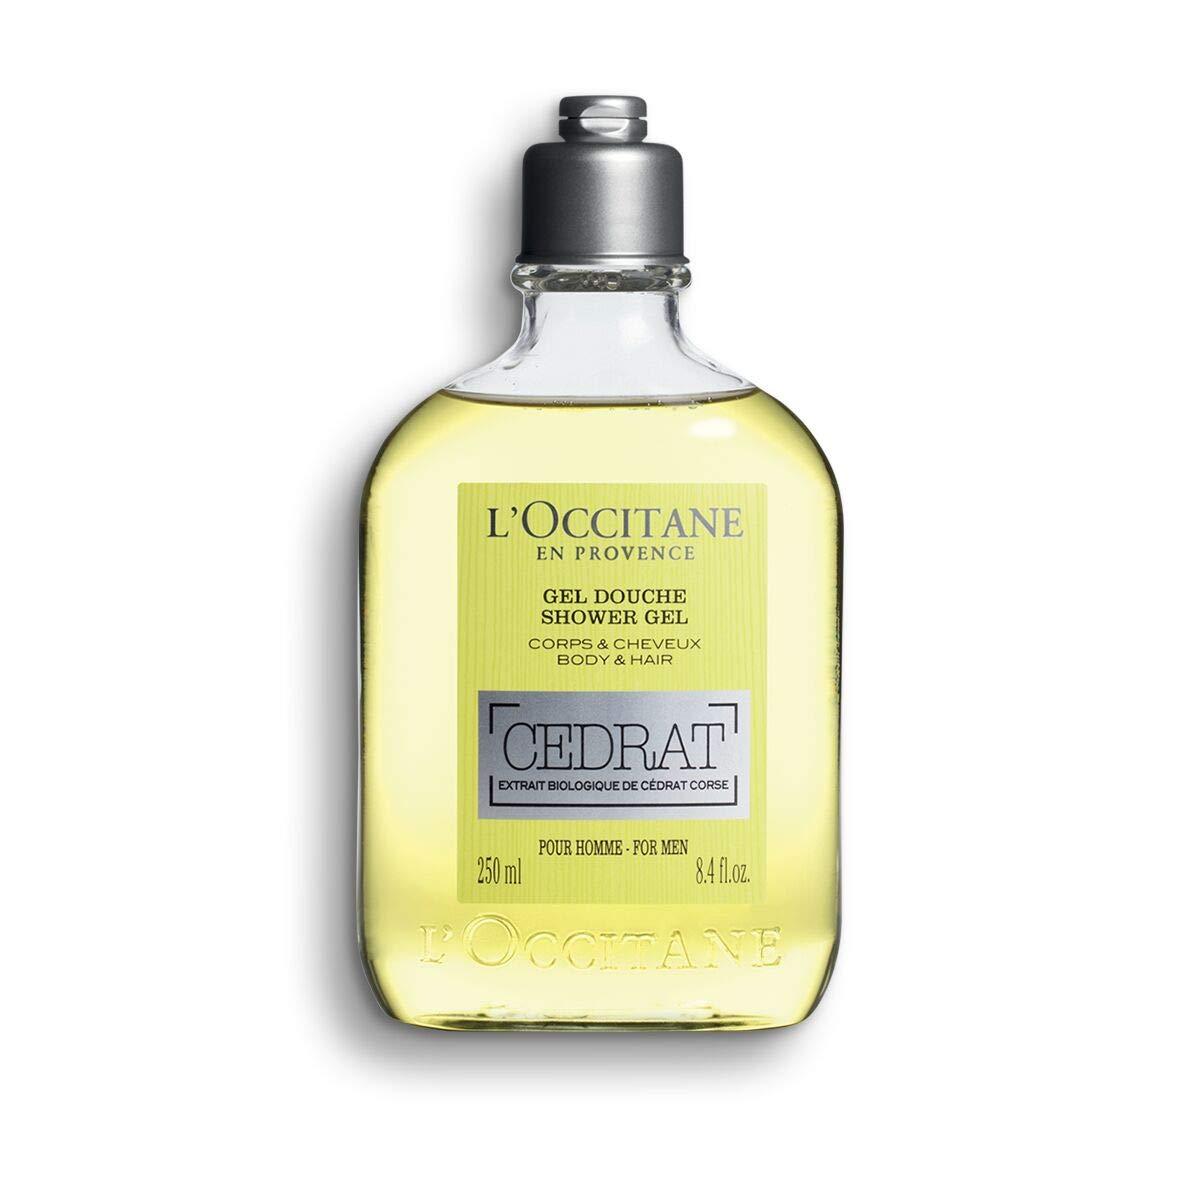 L'Occitane Men's Invigorating Cedrat Shower Gel for Body & Hair, 8.4 Fl Oz by L'Occitane